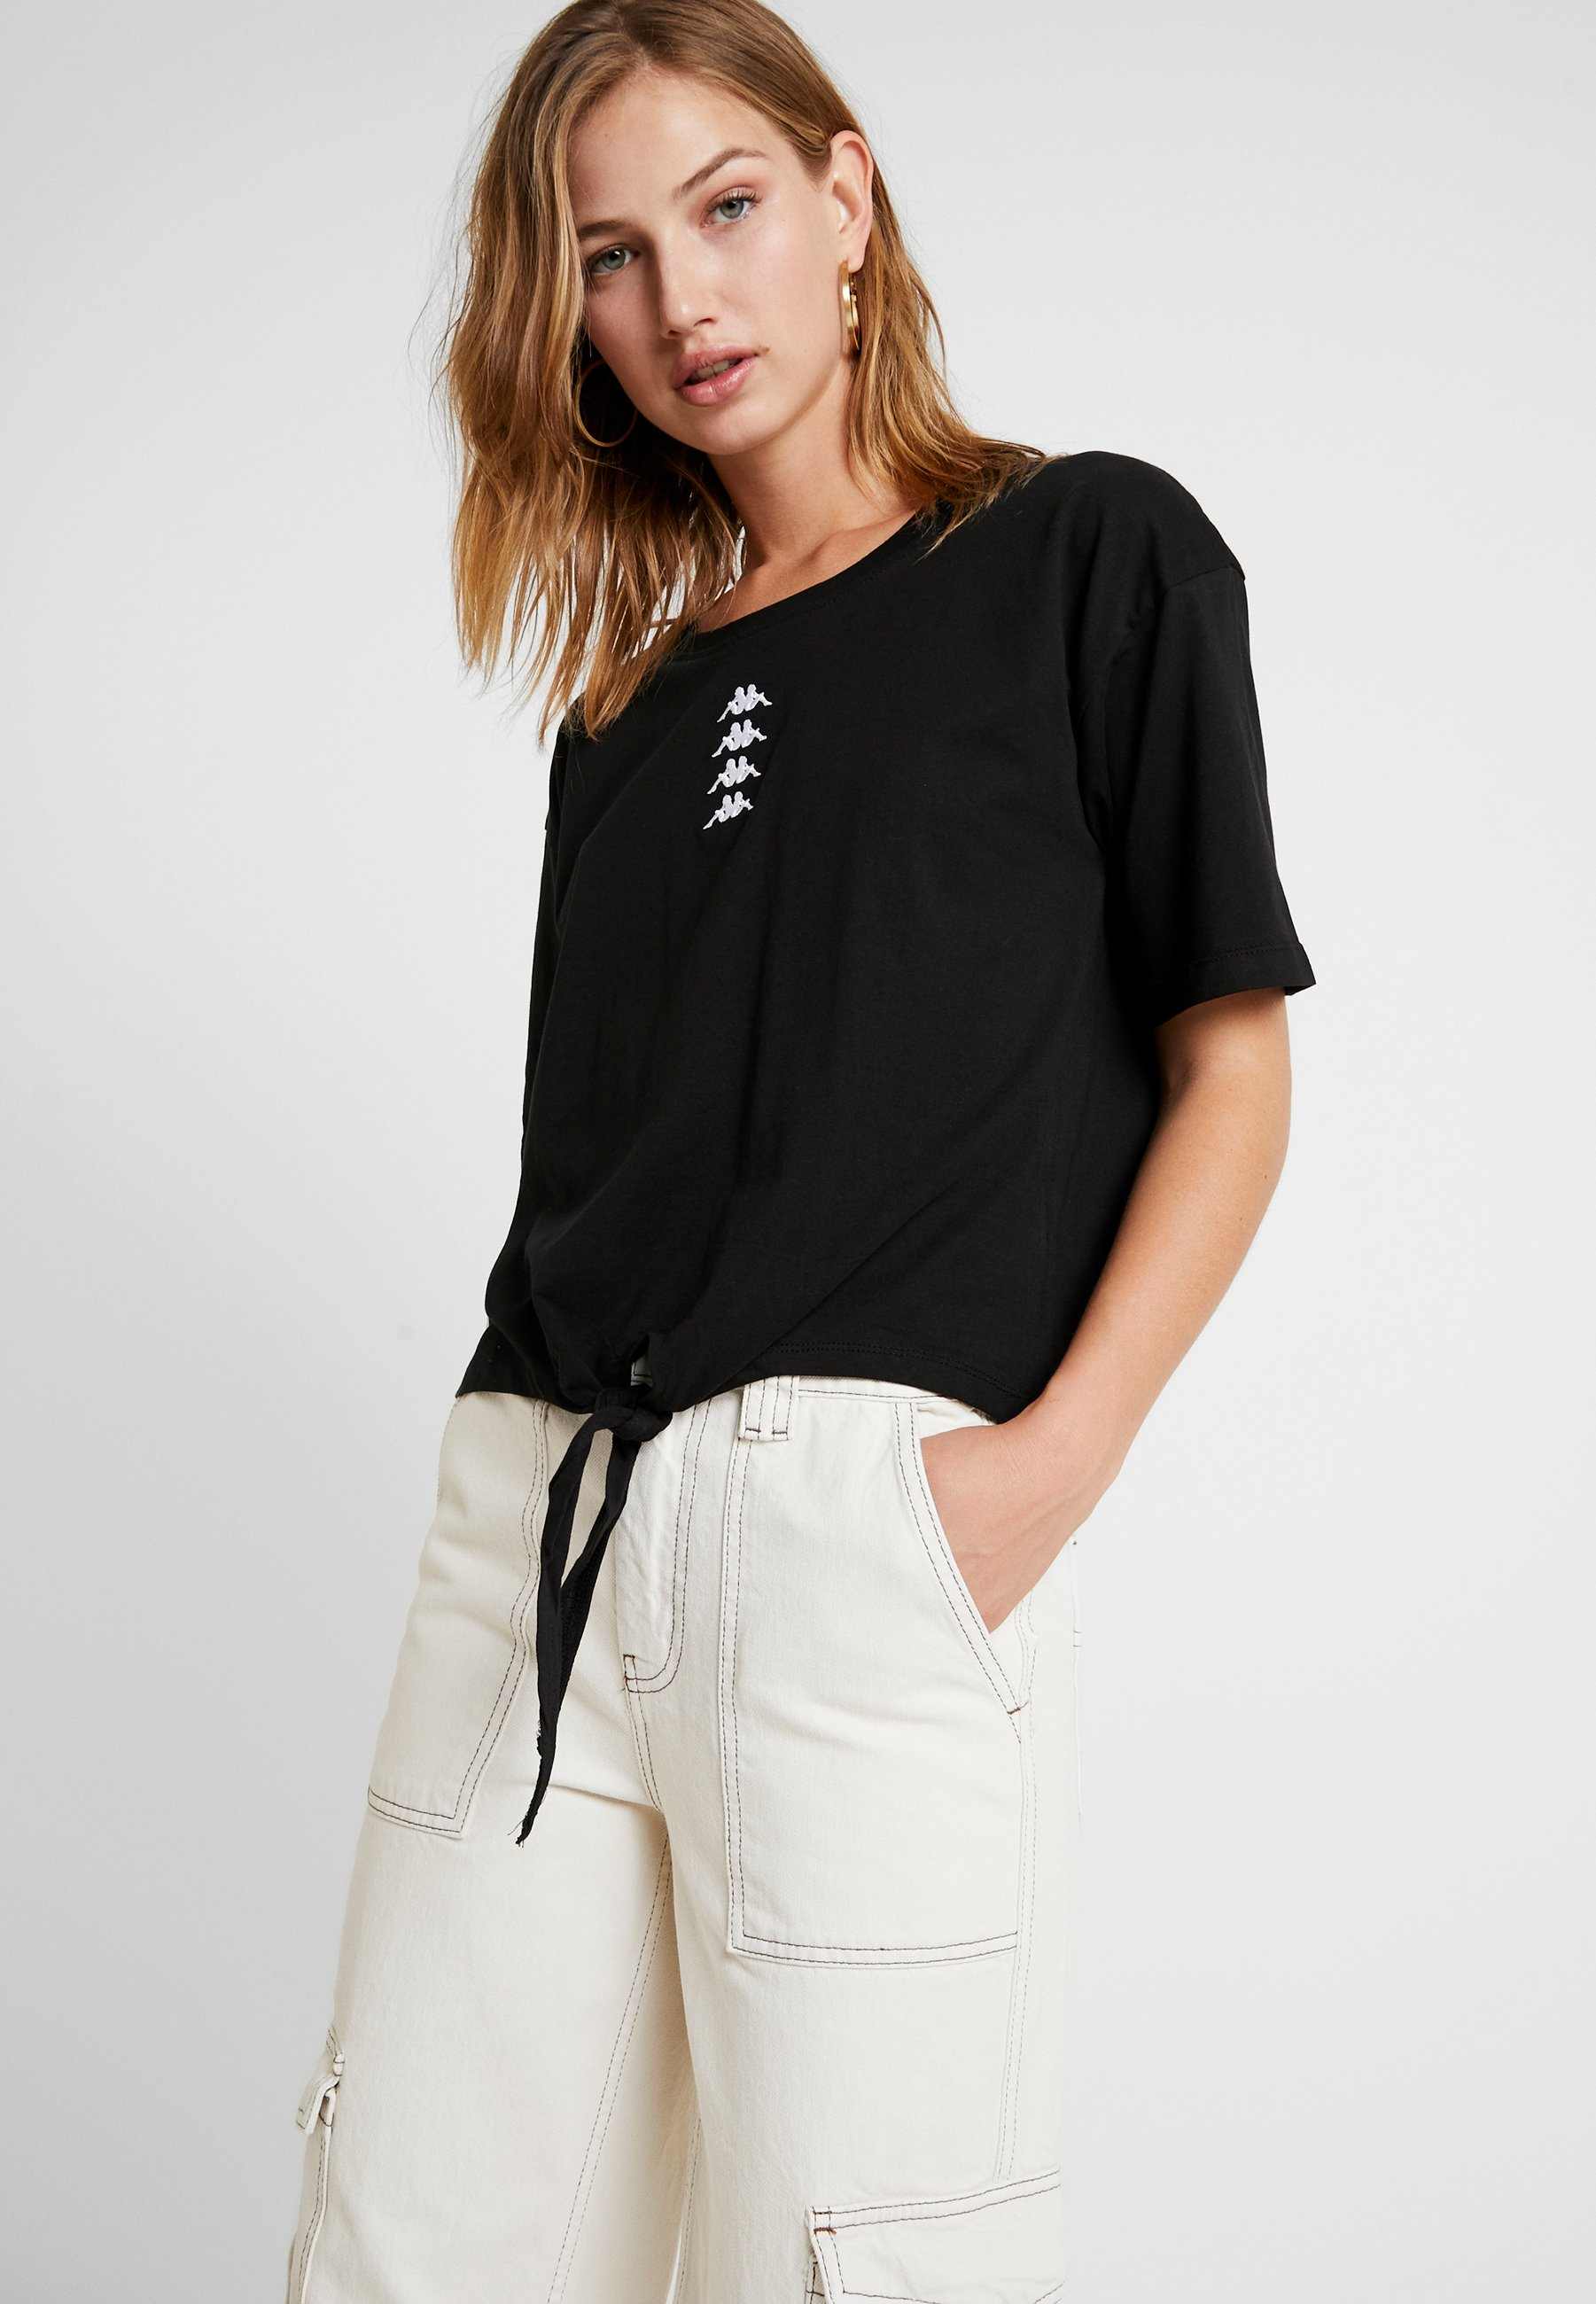 VinkeT shirt Imprimé Black Kappa Kappa vny8mN0wO